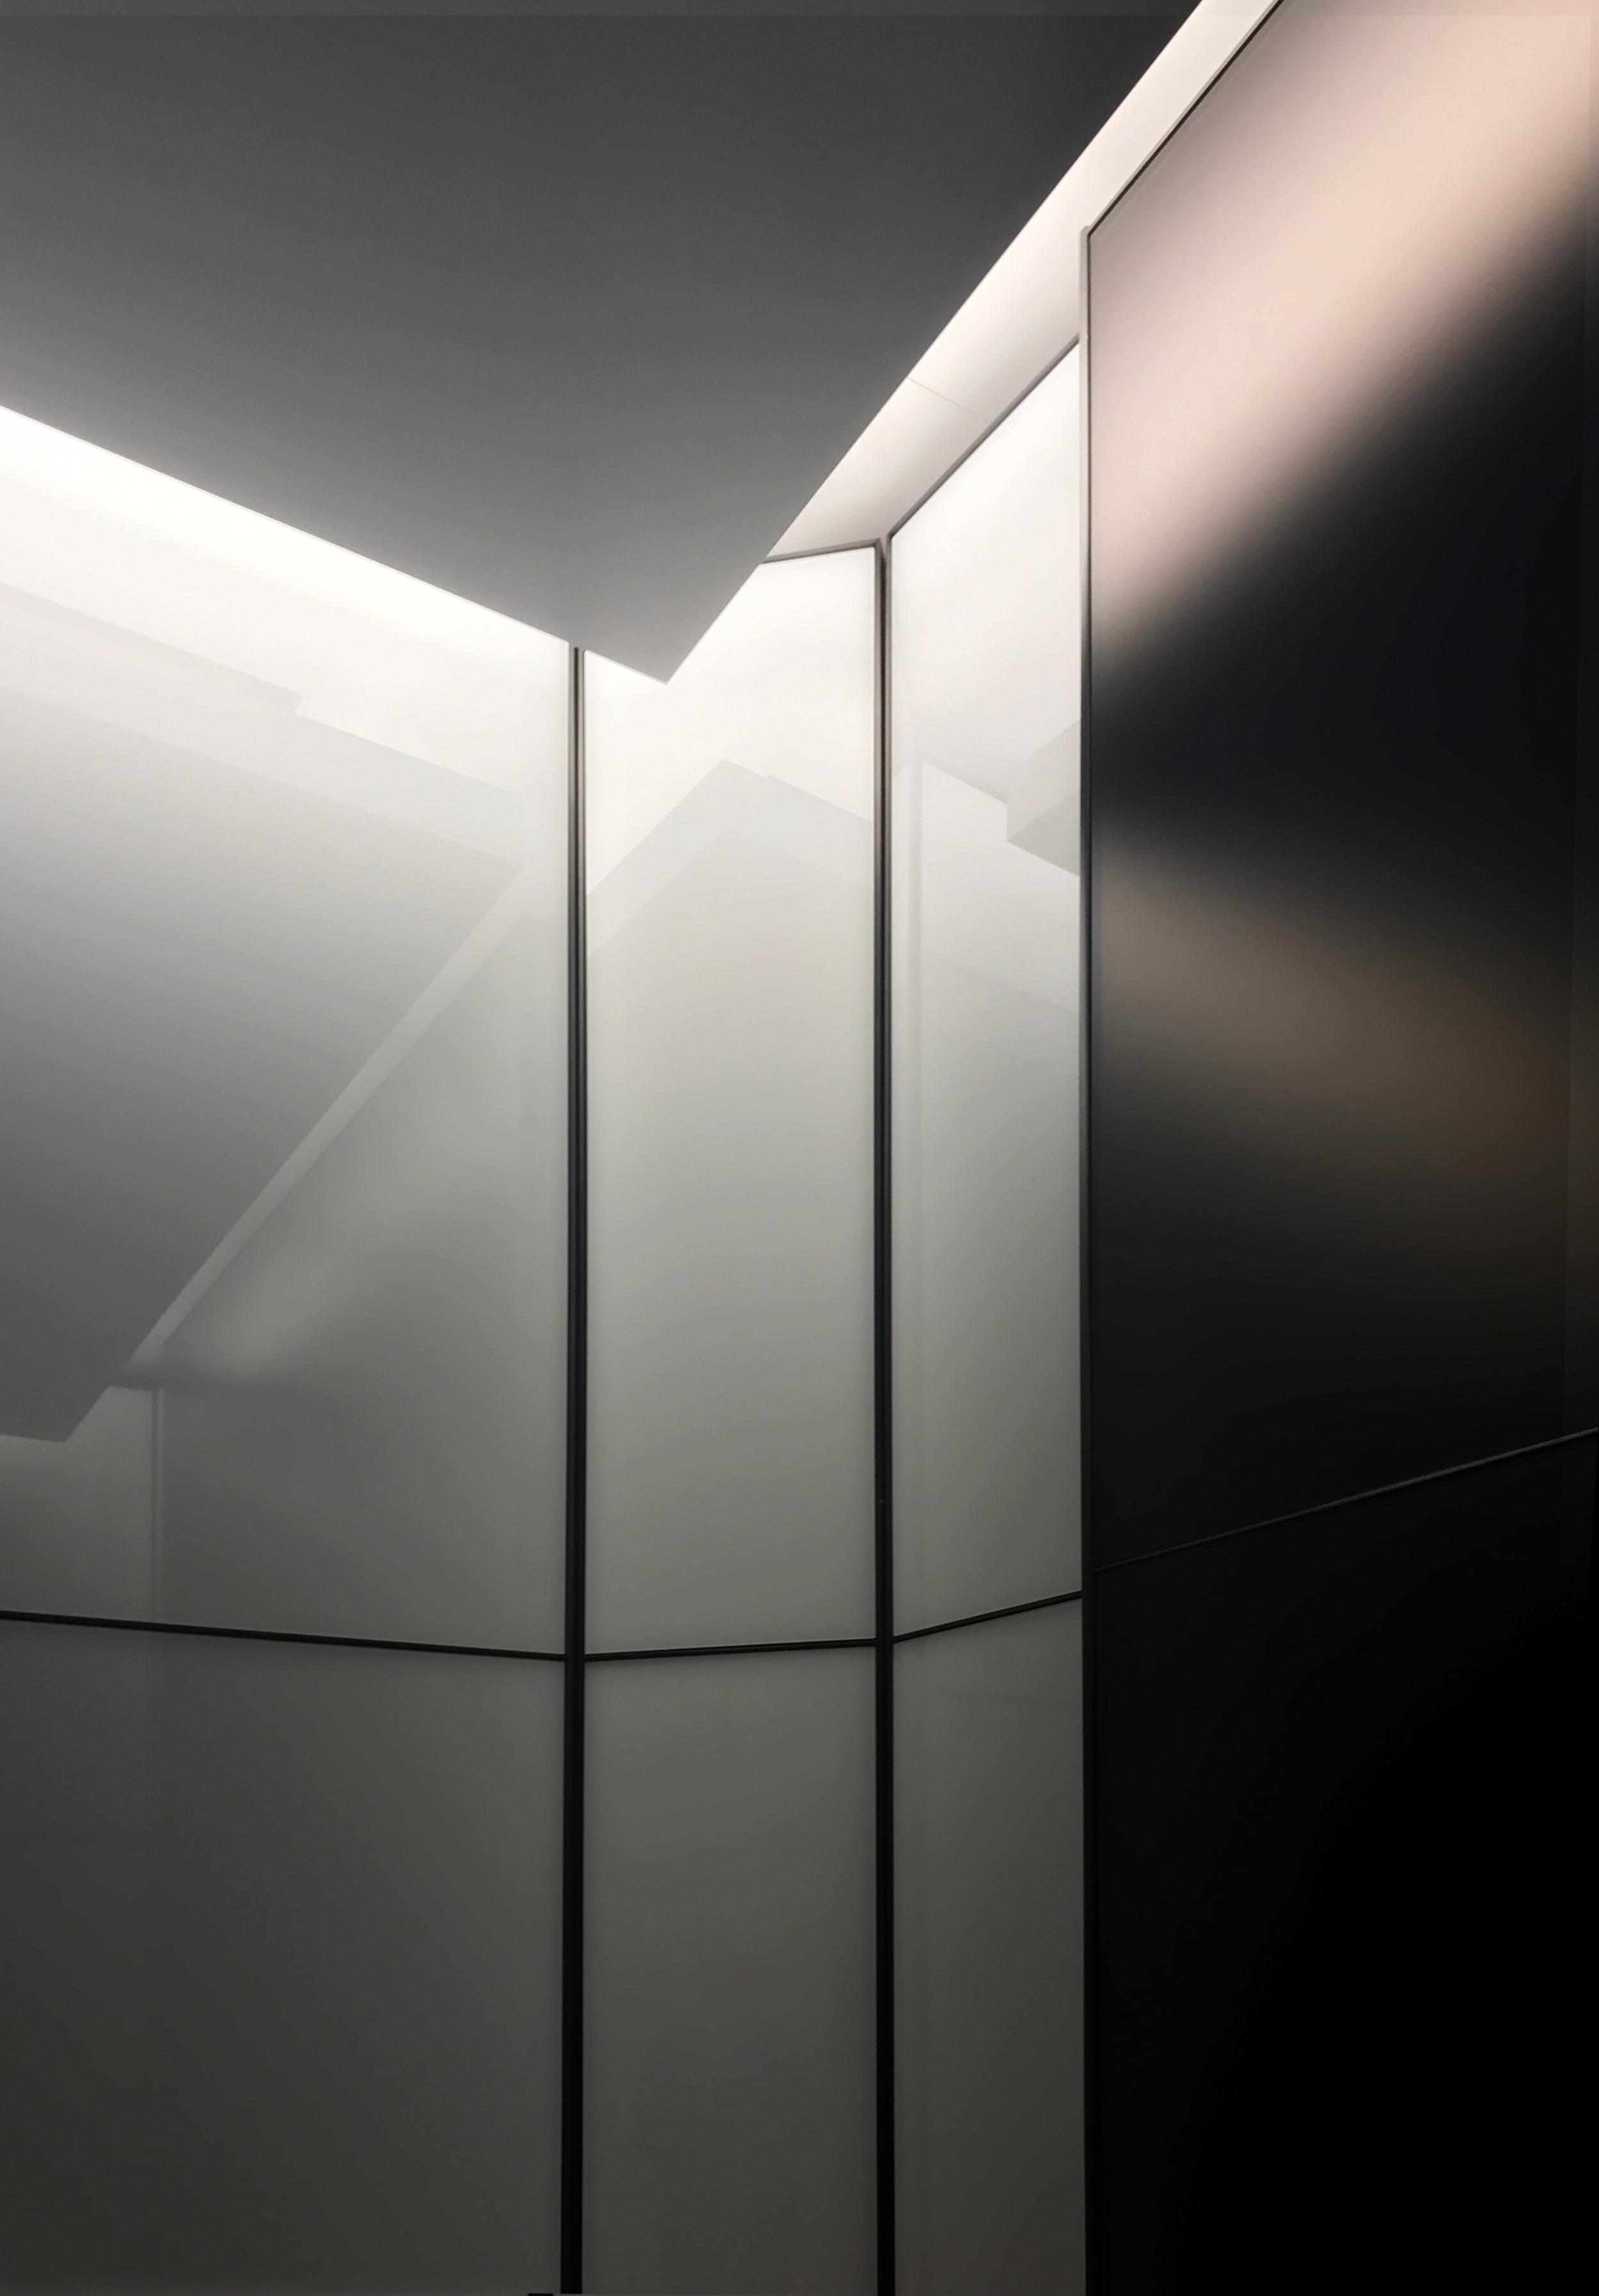 11_WALL_corner_detail_001.png